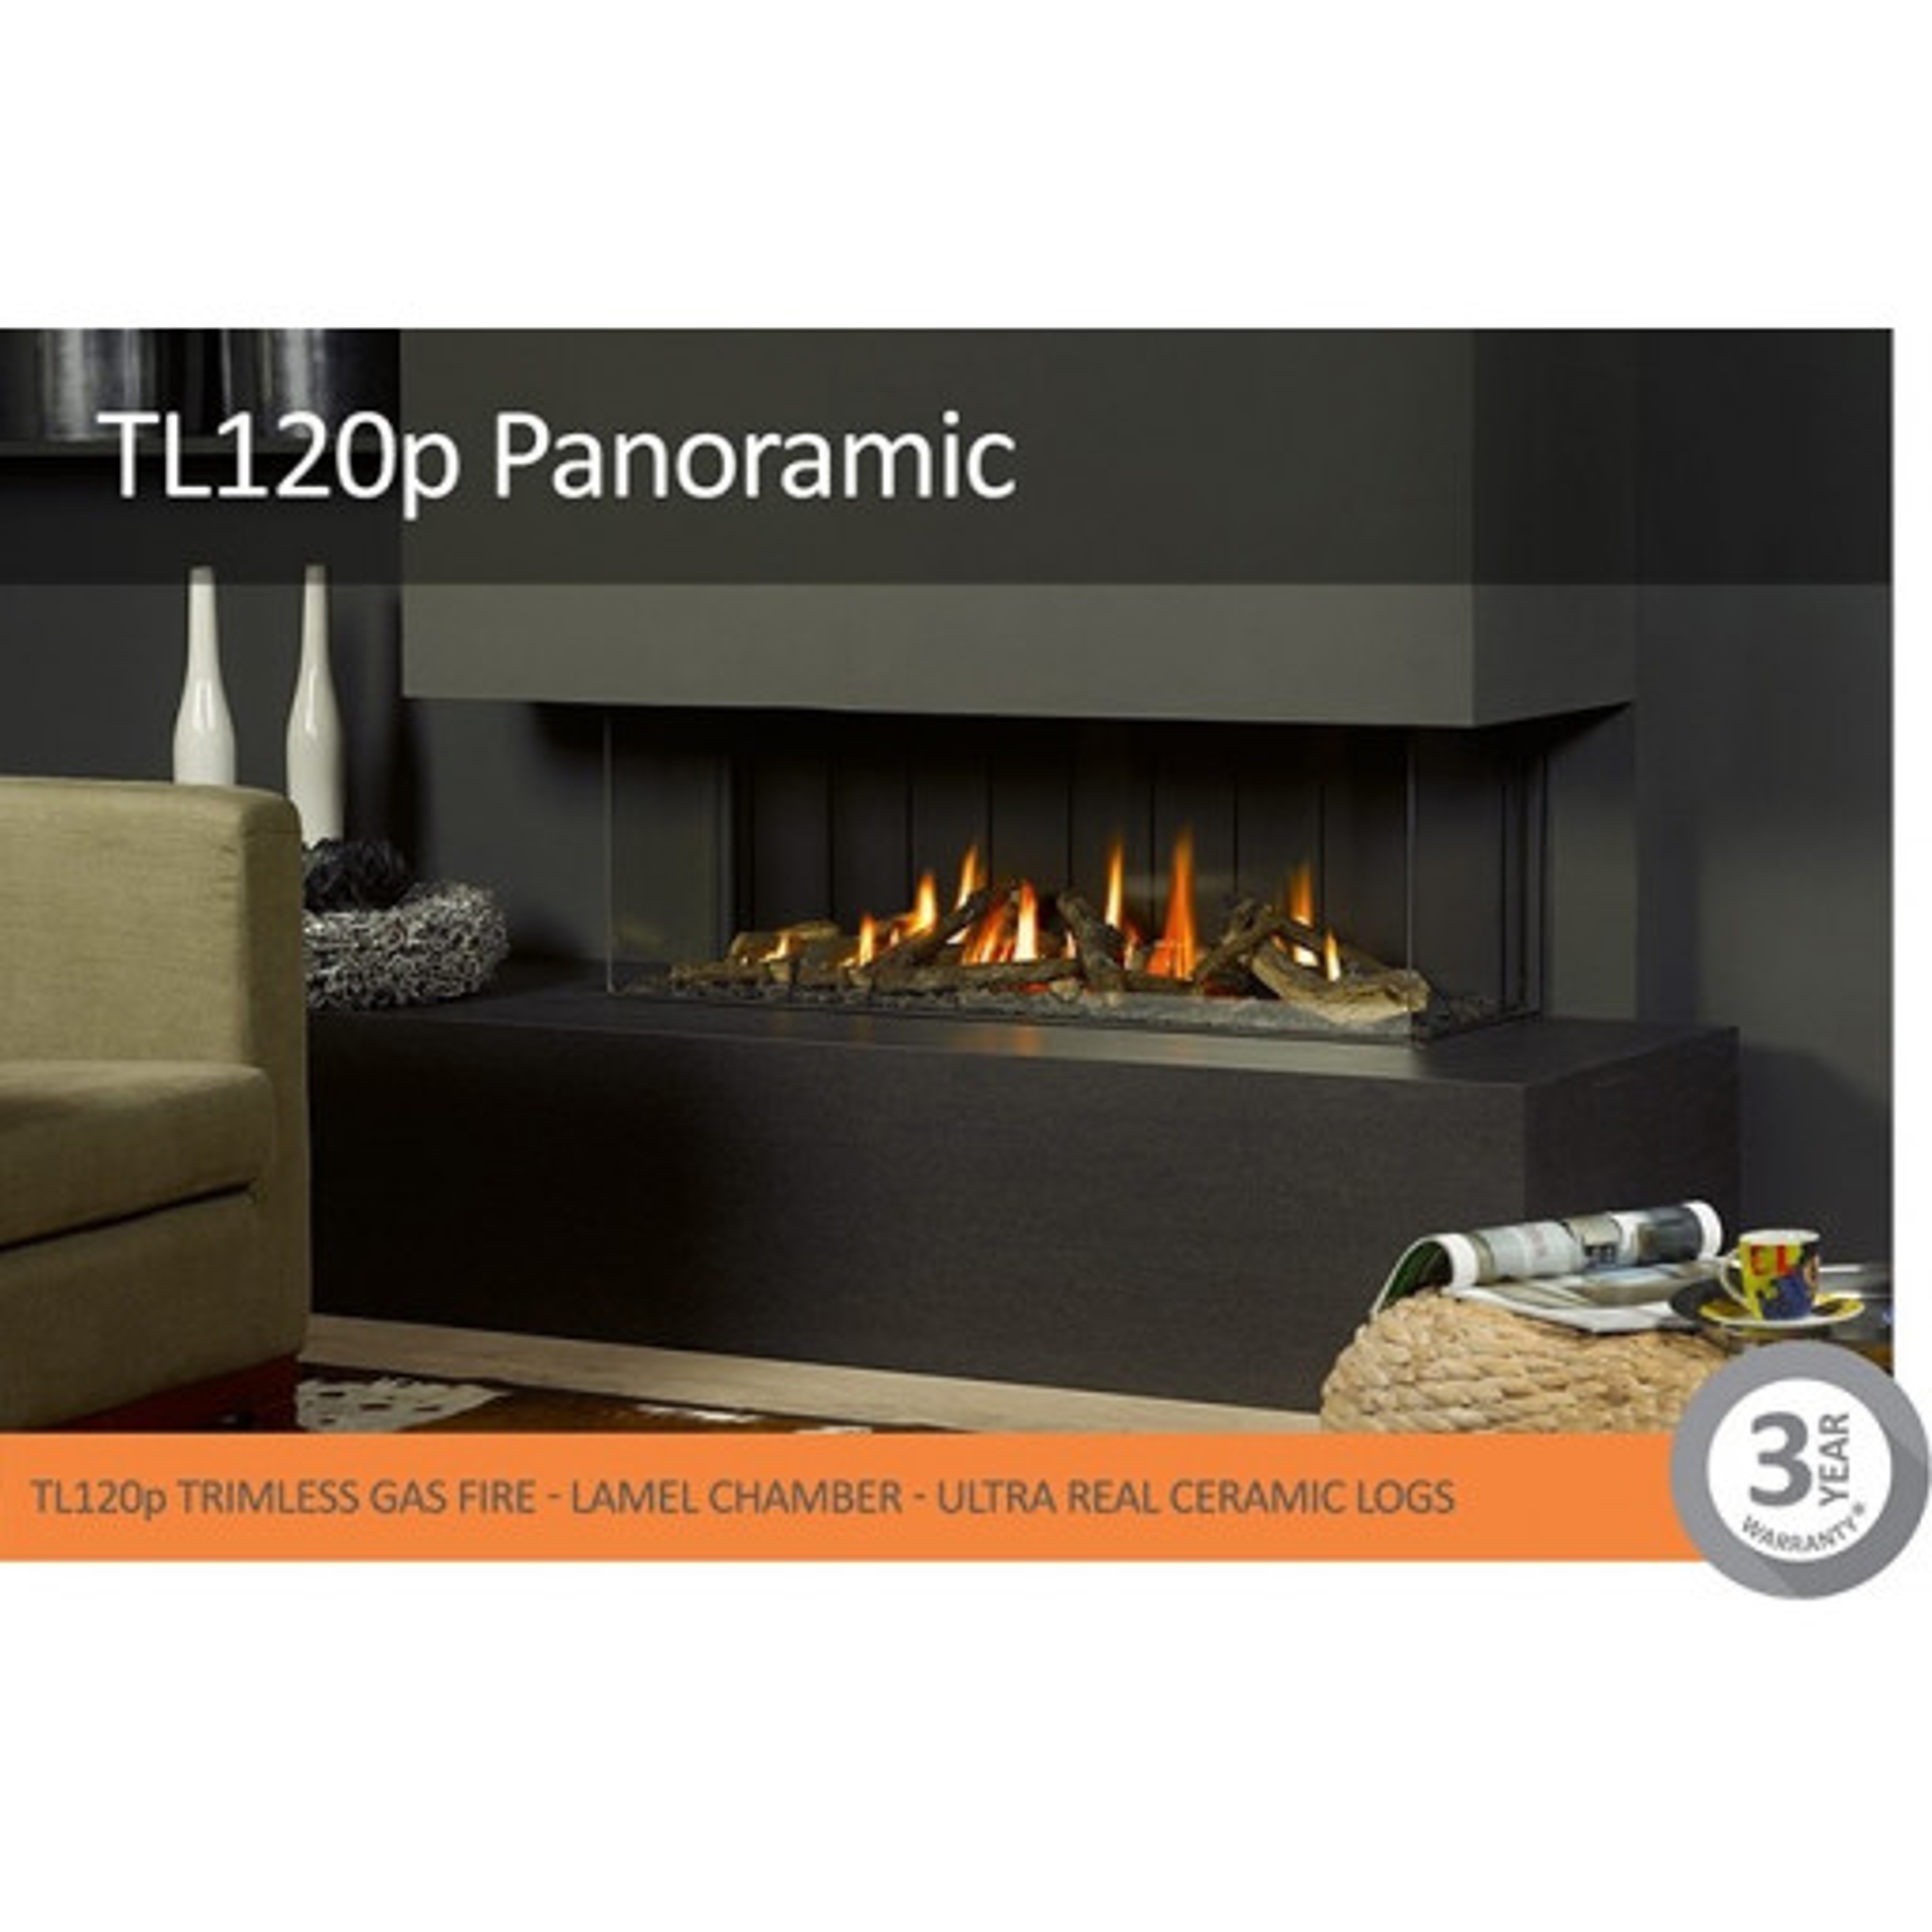 Vision Trimline TL120P Panoramic #FPW